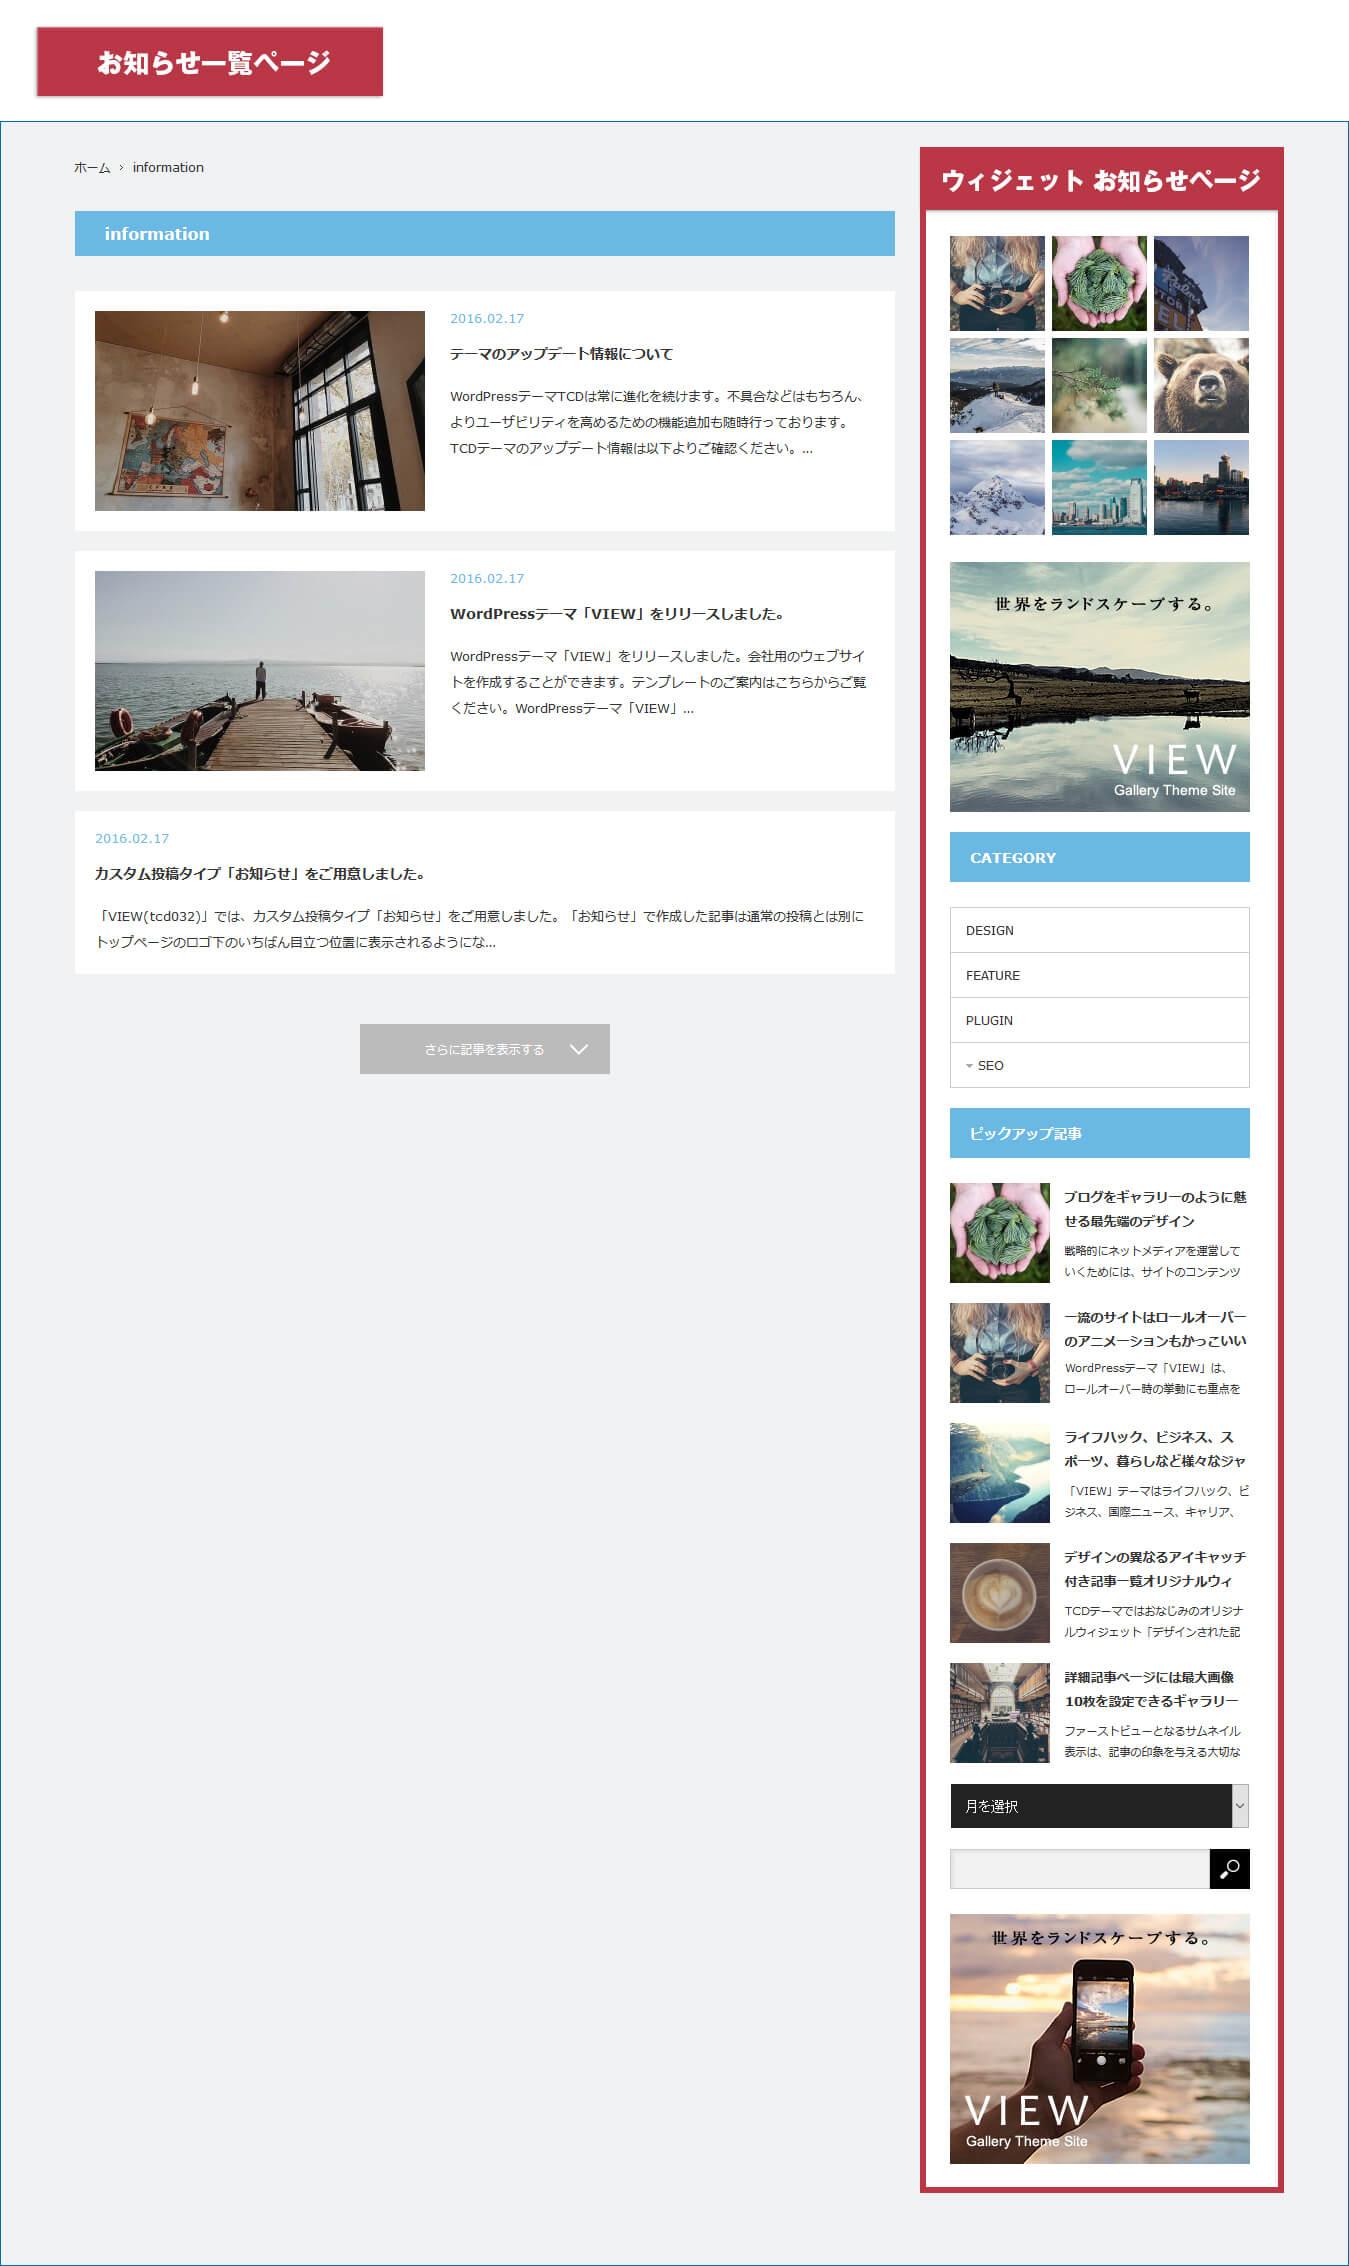 view-info